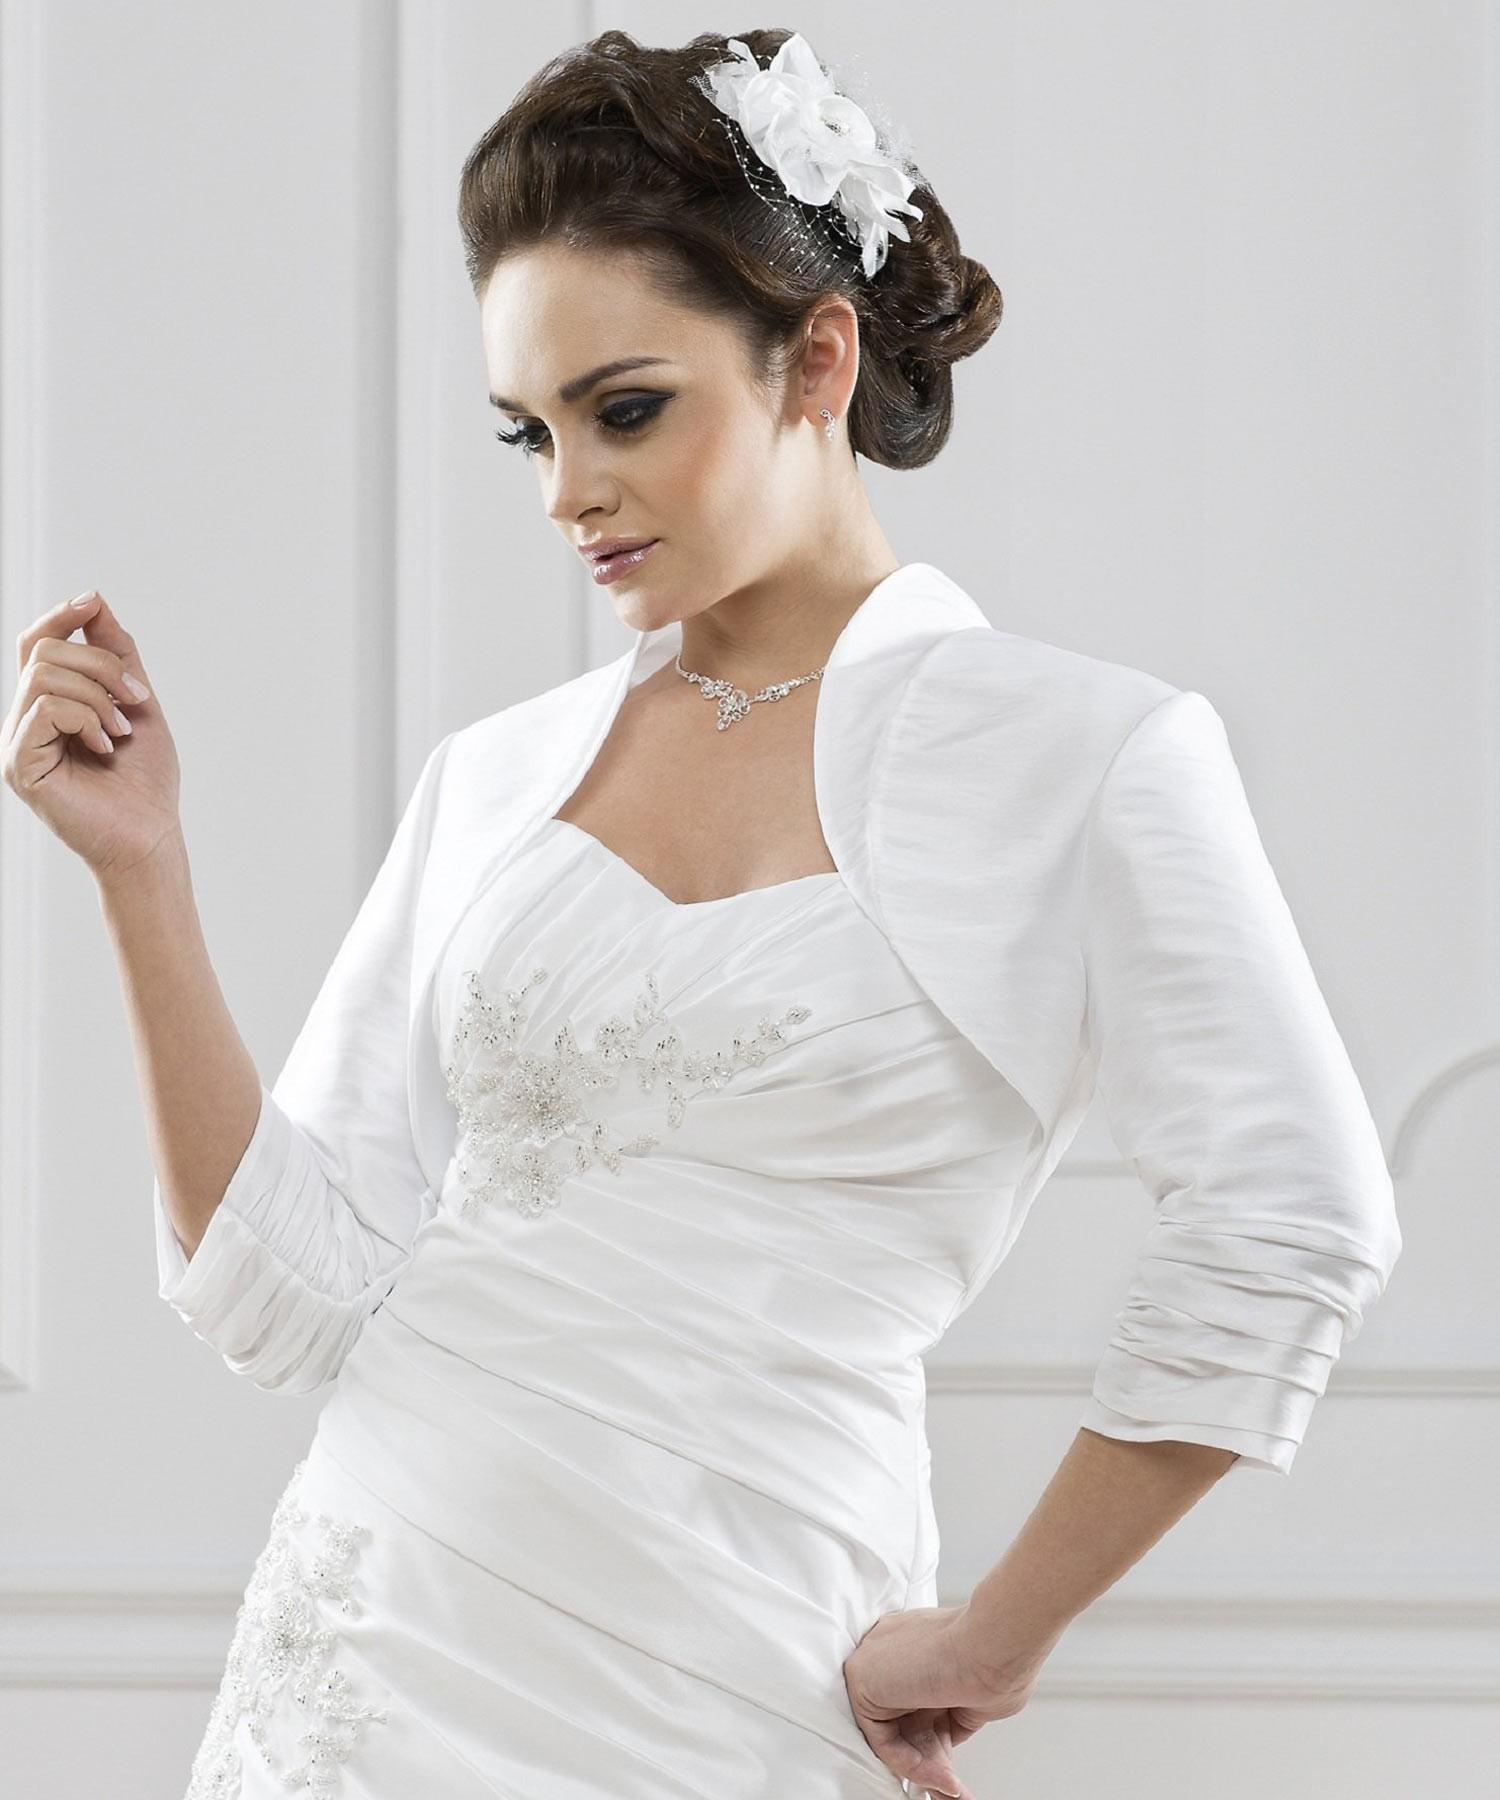 bolro mariage taffetas melissa blanc - Bolero Mariage Blanc